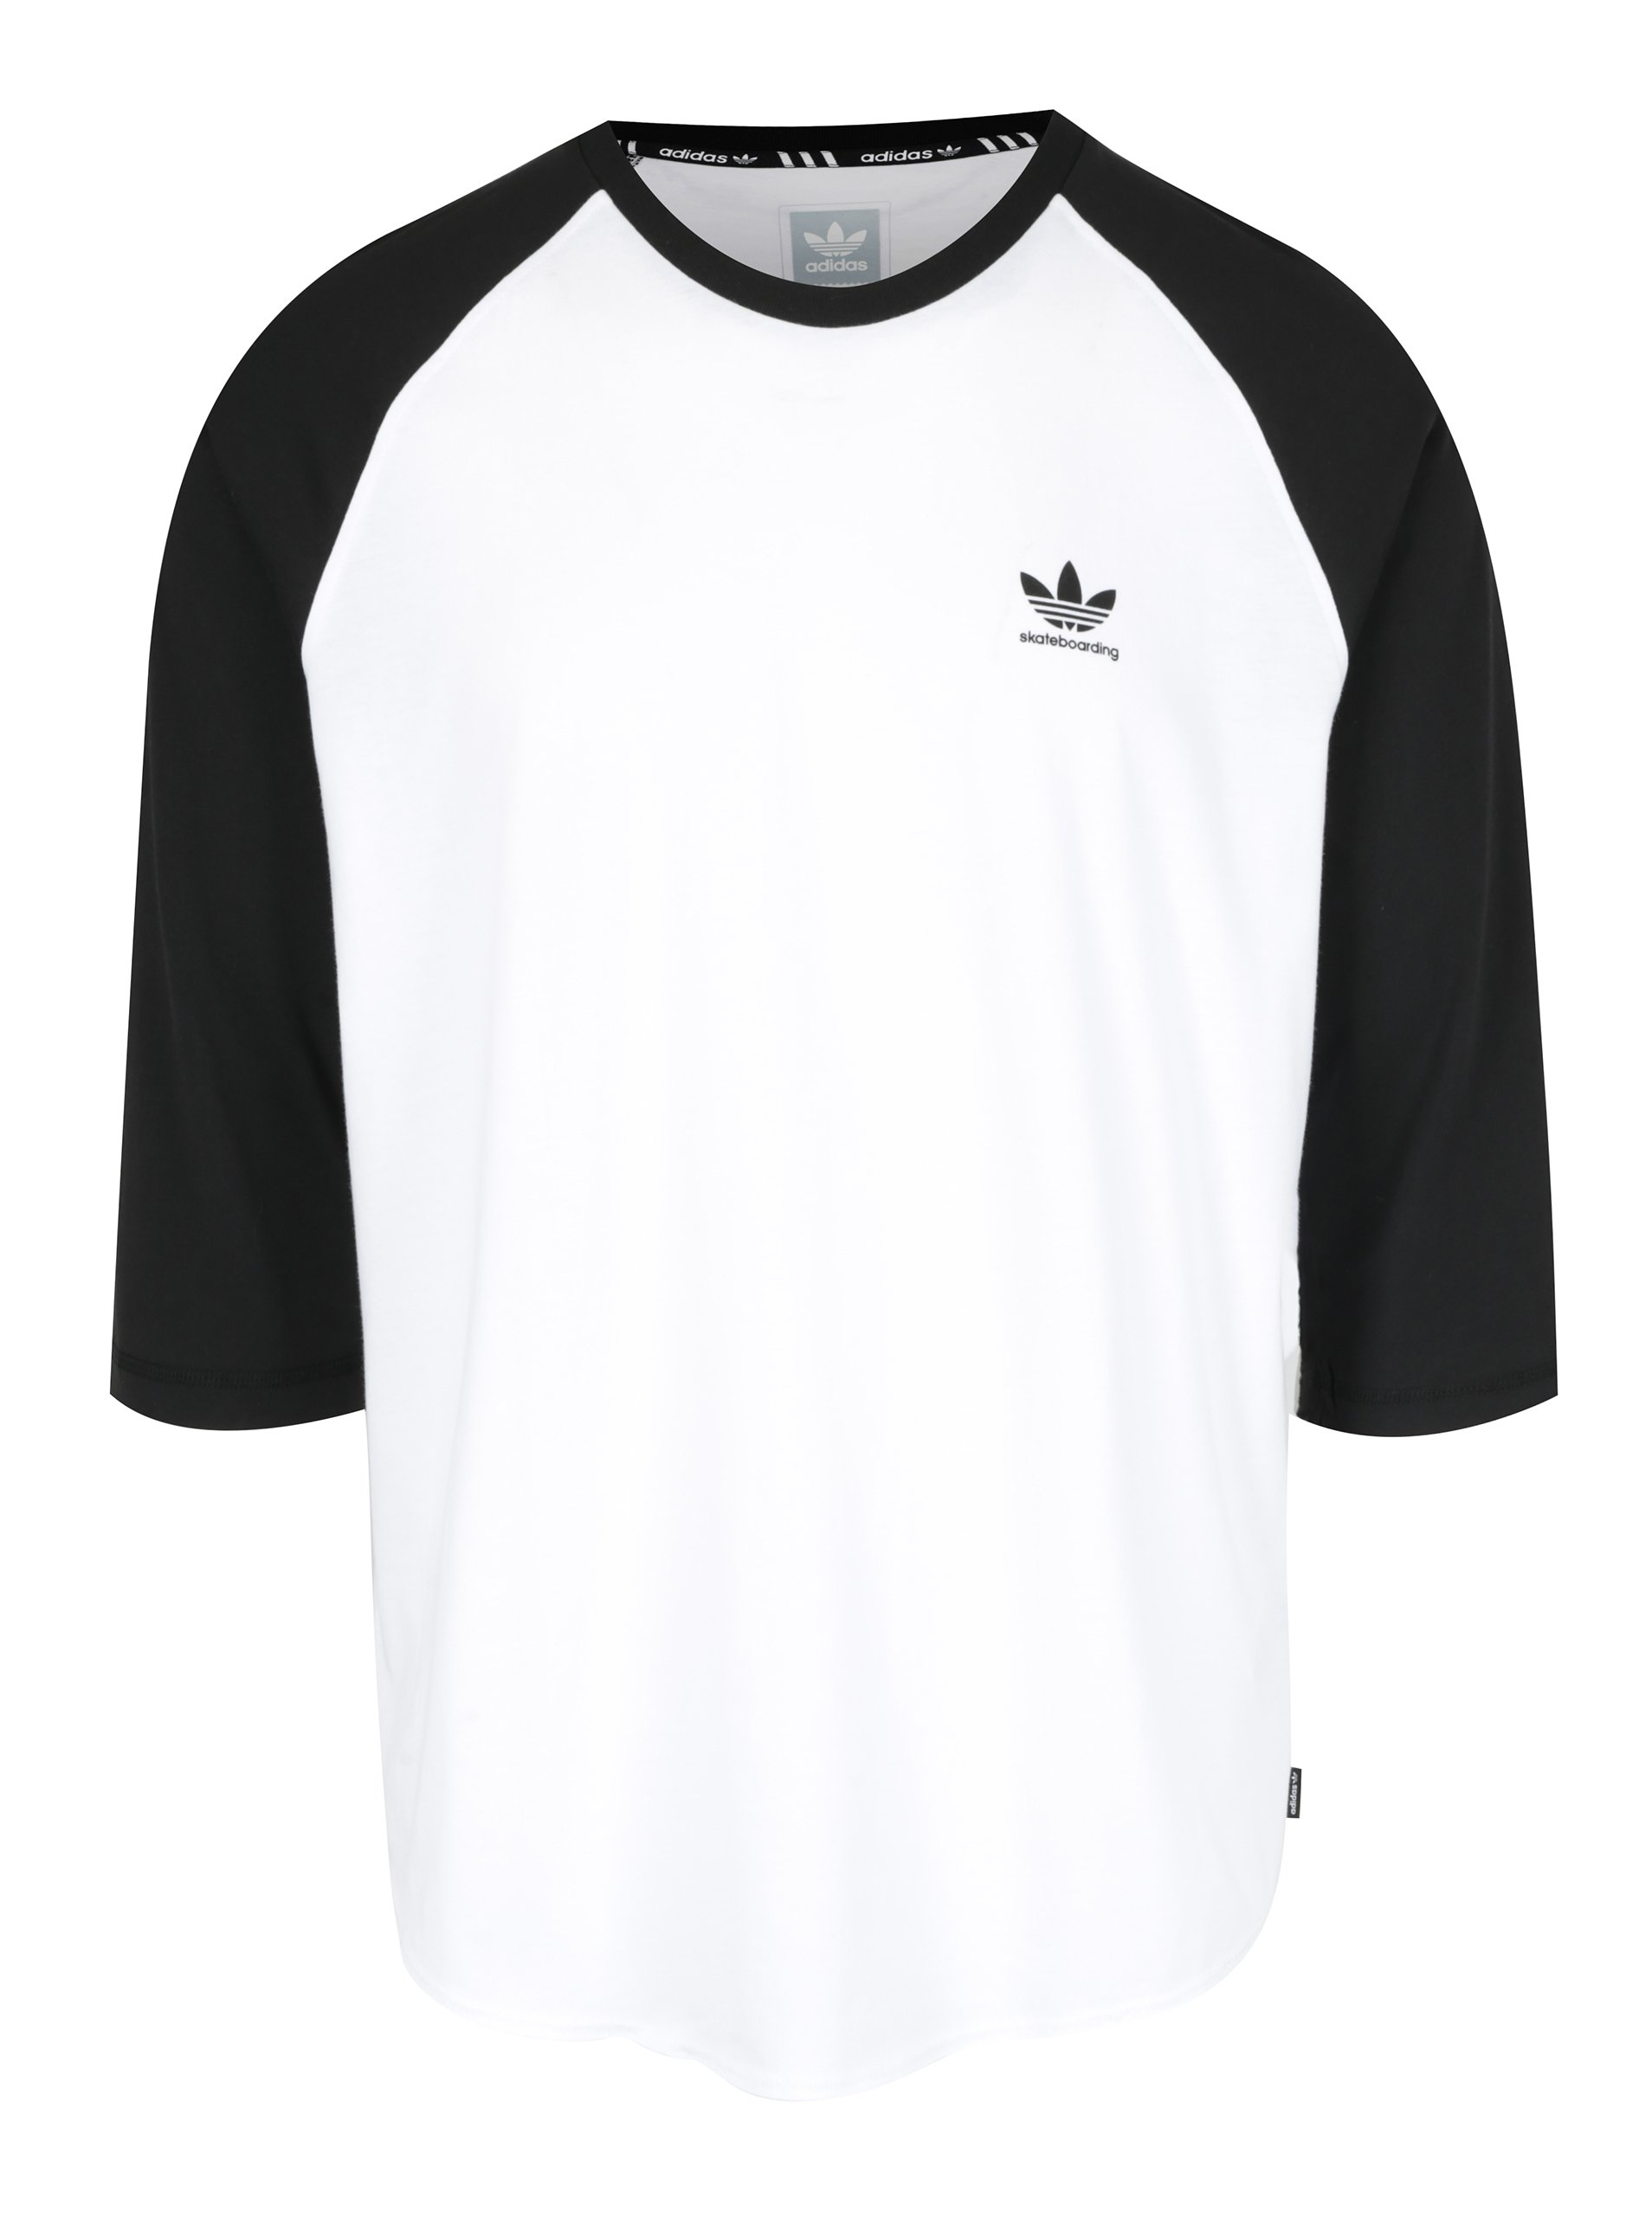 Černo-bílé pánské tričko s 3/4 rukávem adidas Originals